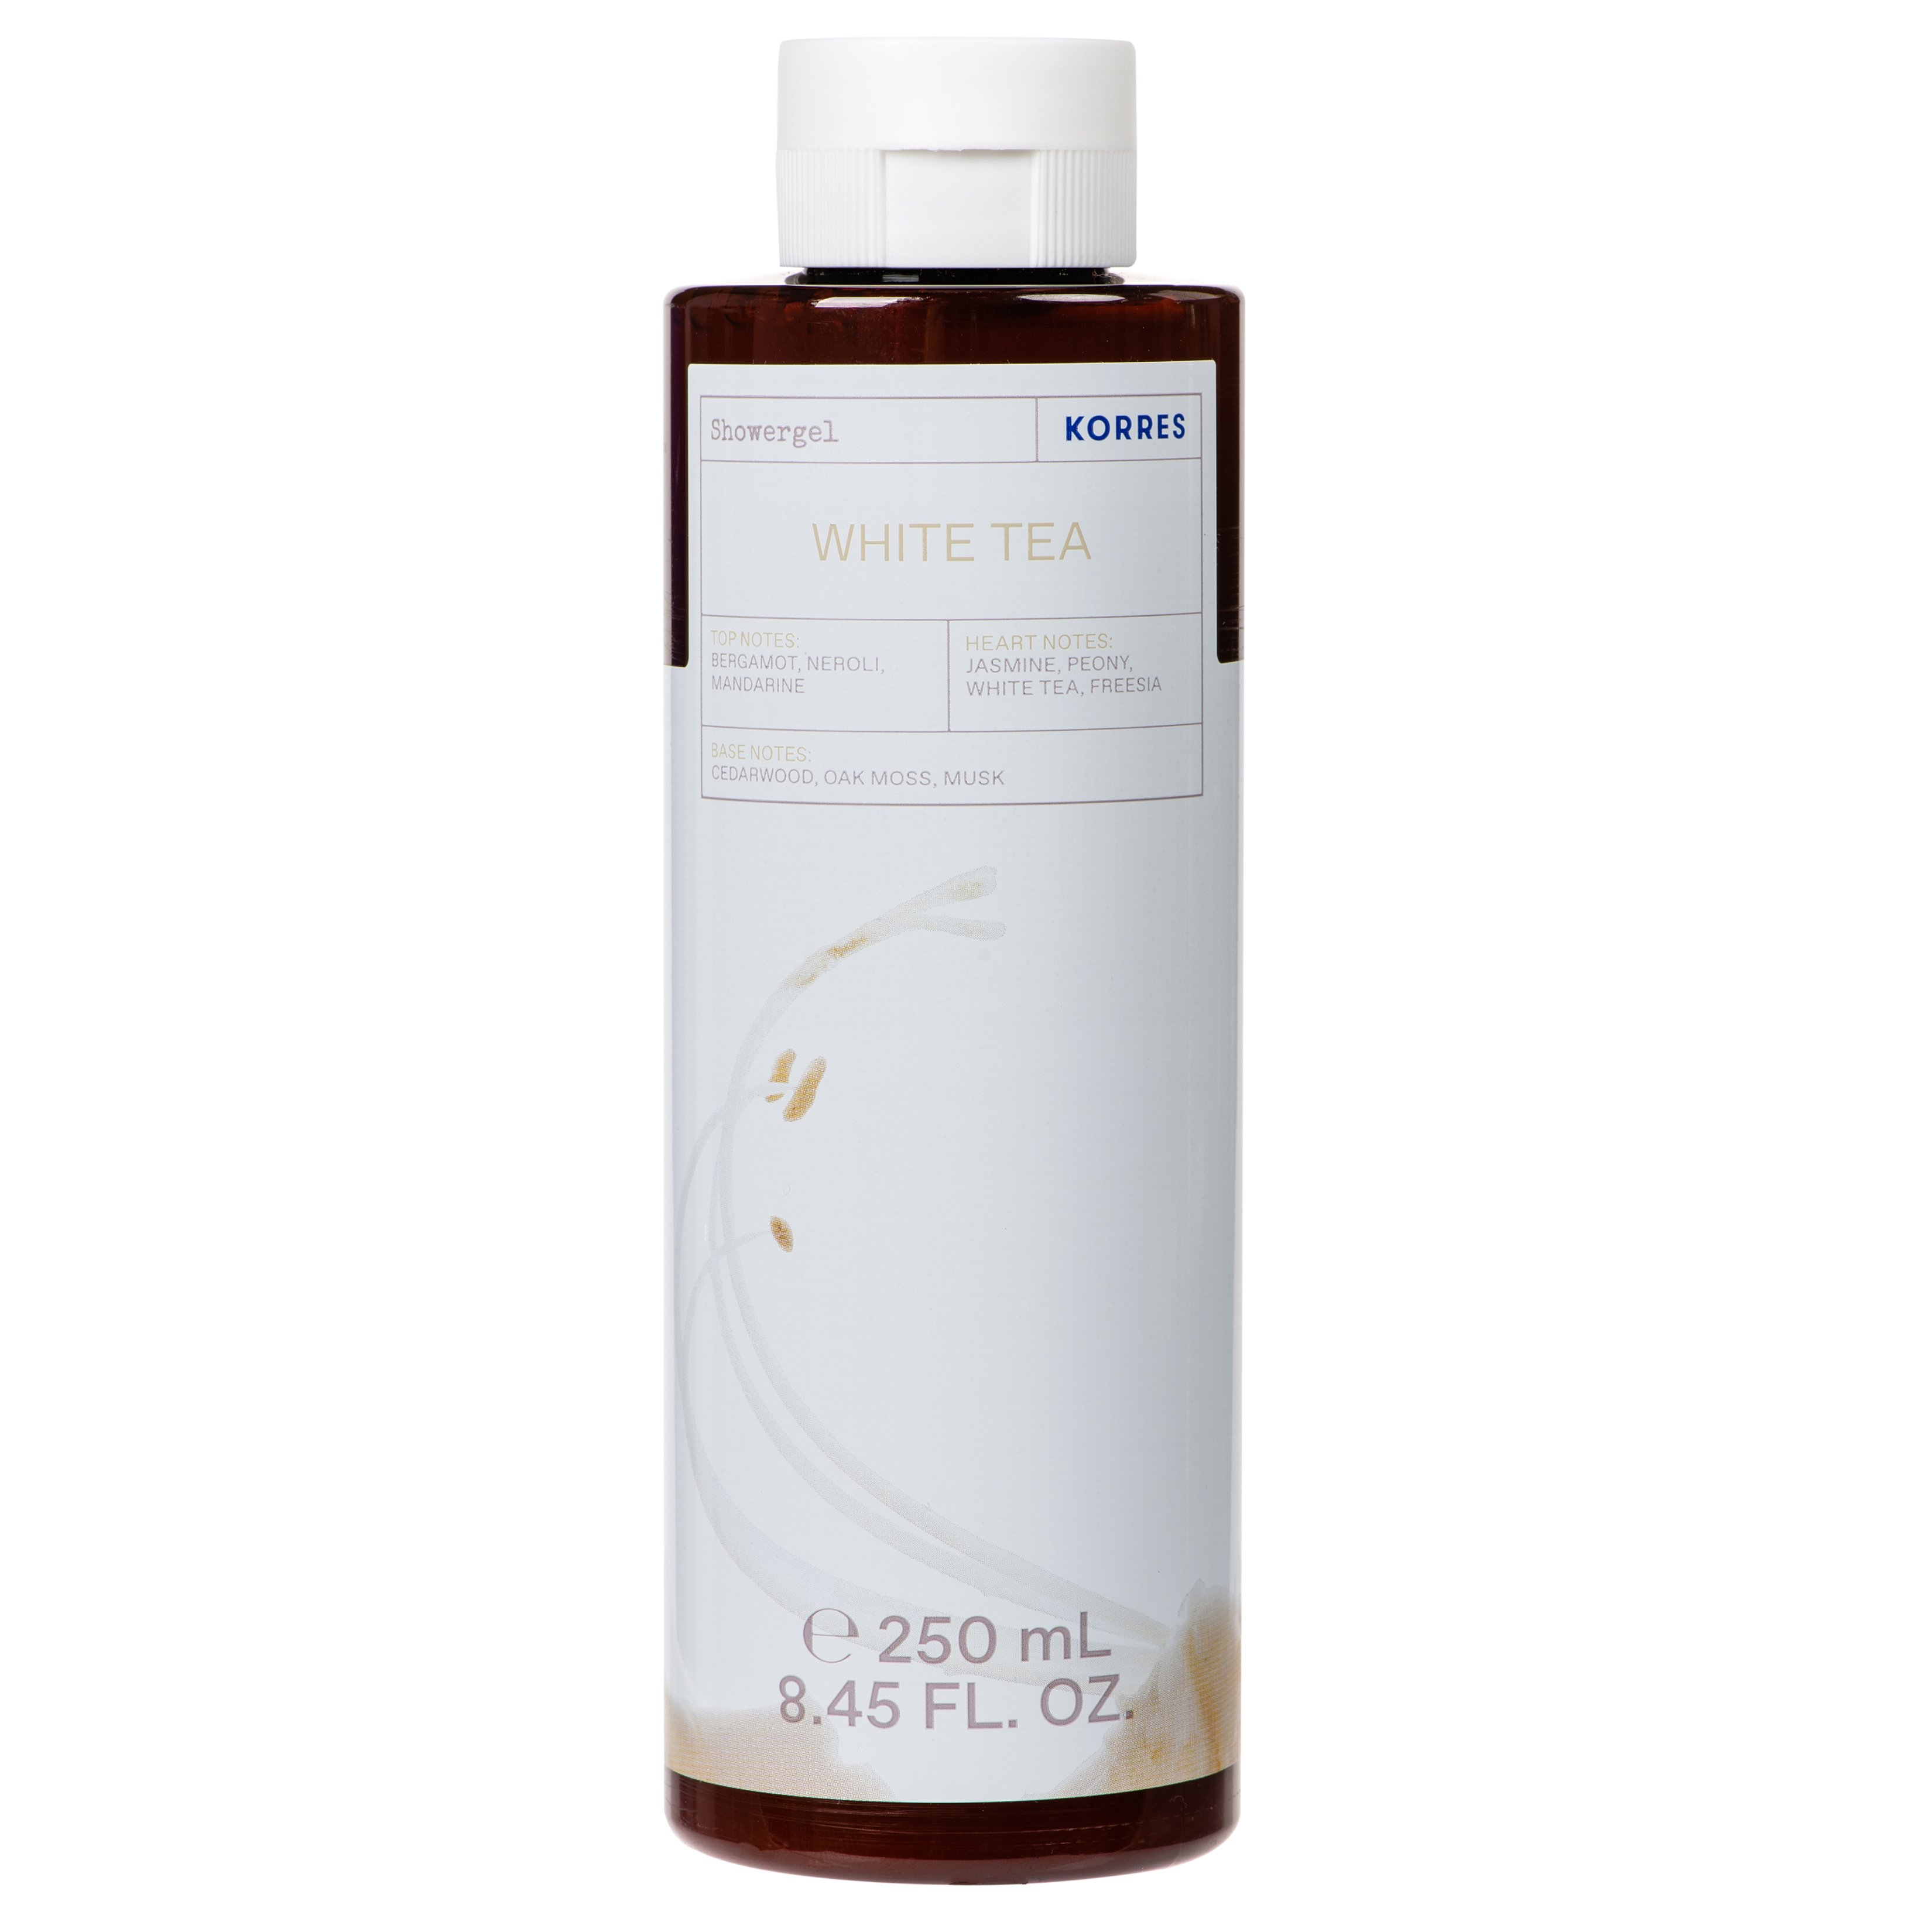 Korres White Tea Showergel Αρωματικό Αφρόλουτρο με Ενυδατικούς Παράγοντες 250ml